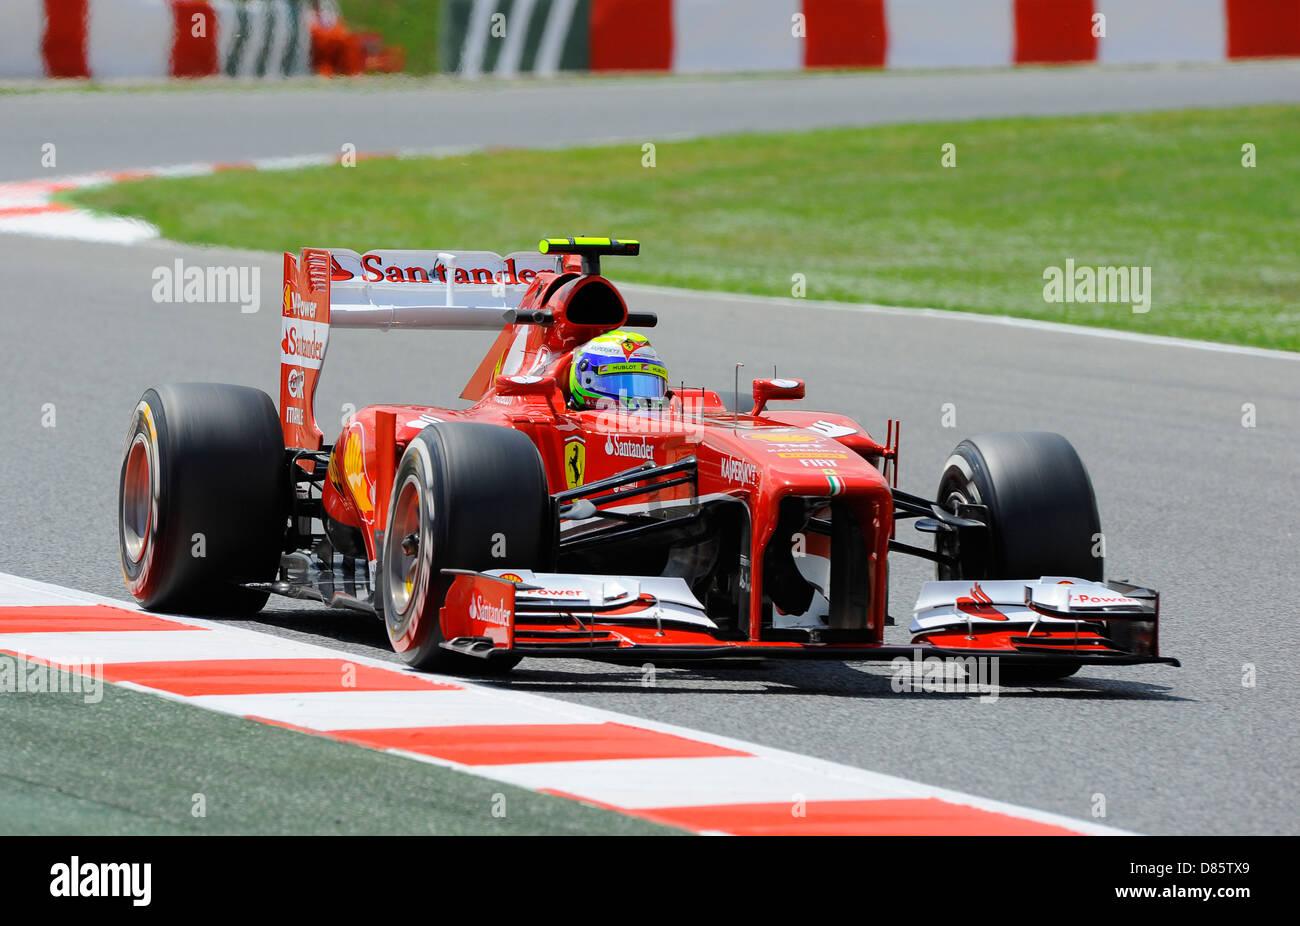 Felipe Massa (BRA), Ferrari F138 during the Spanish Formula One Grand Prix race 2013 - Stock Image